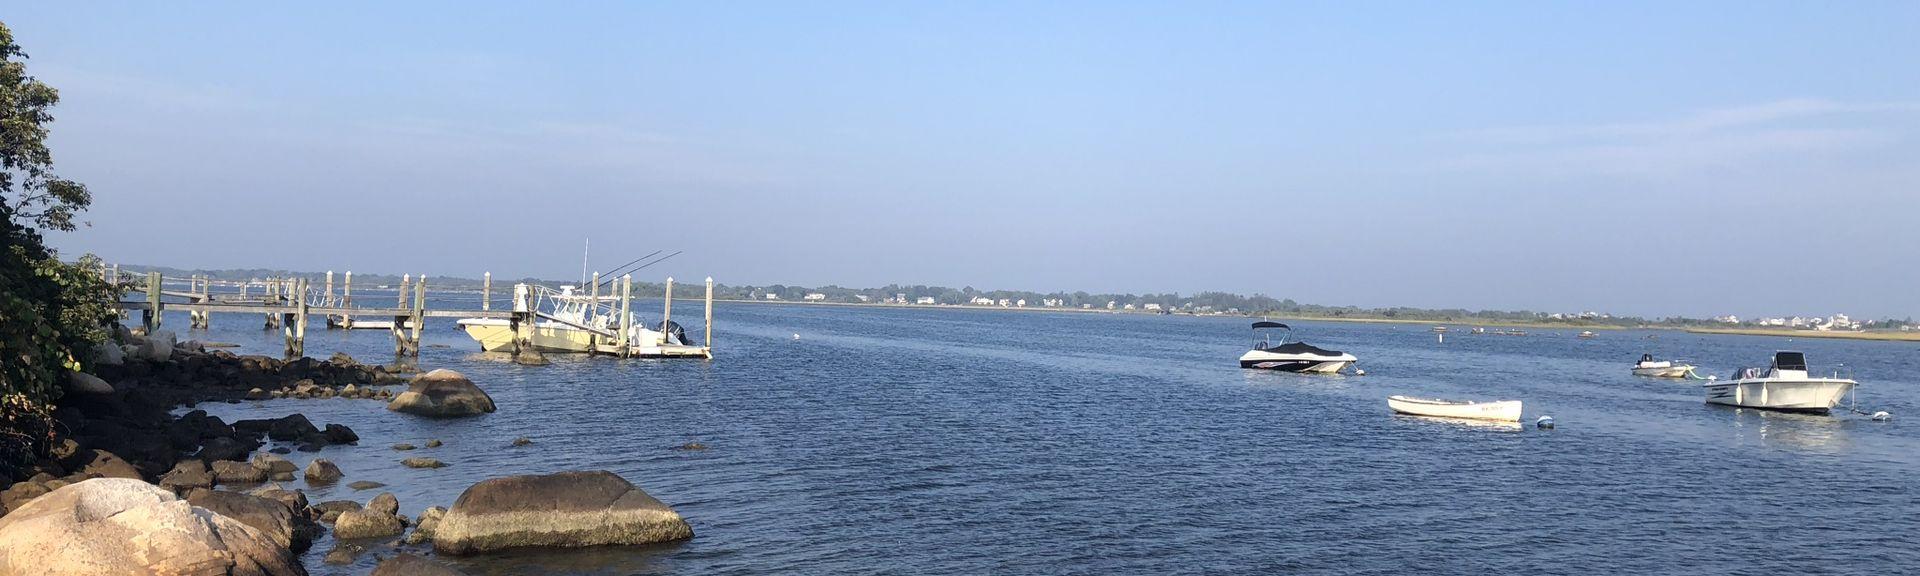 Shelter Harbor, Rhode Island, Yhdysvallat